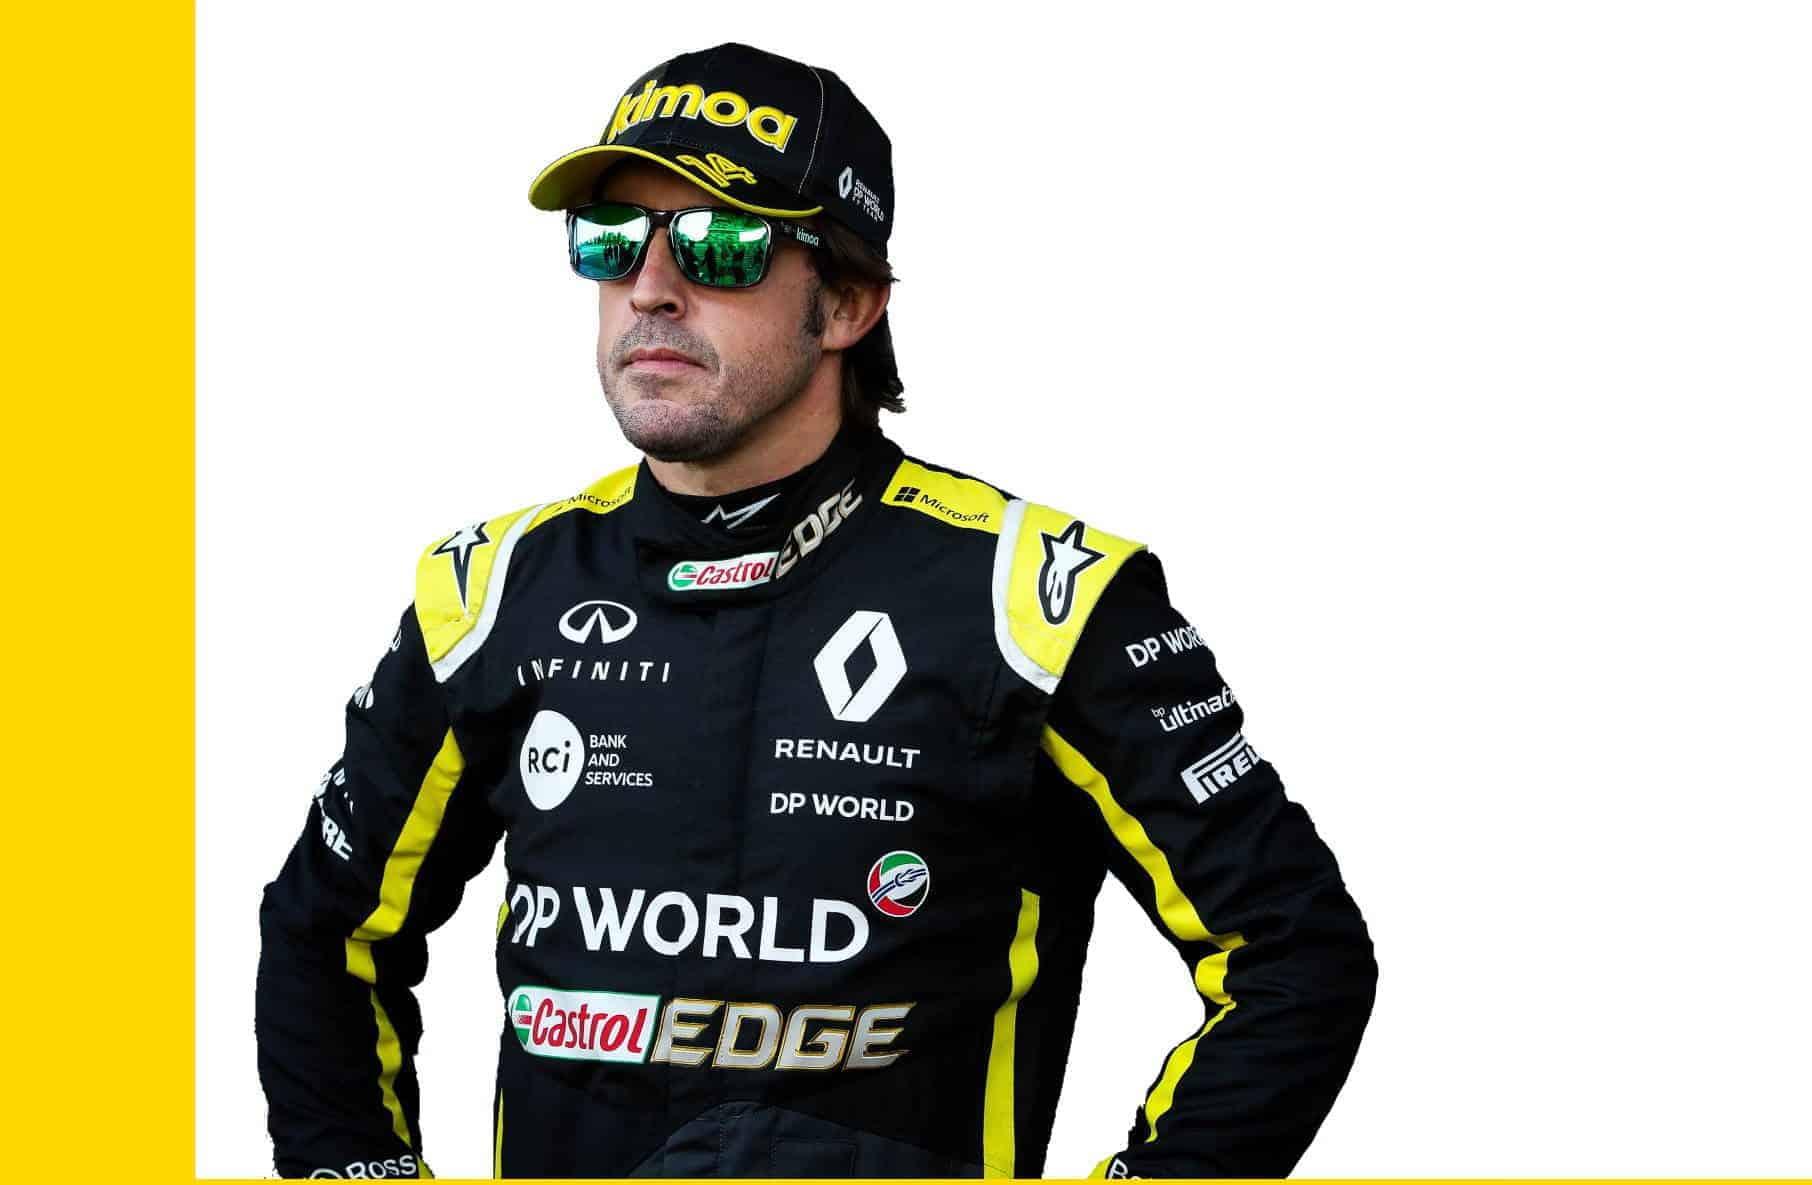 Fernando Alonso F1 2021 Photo Renault Edited by MAXF1net